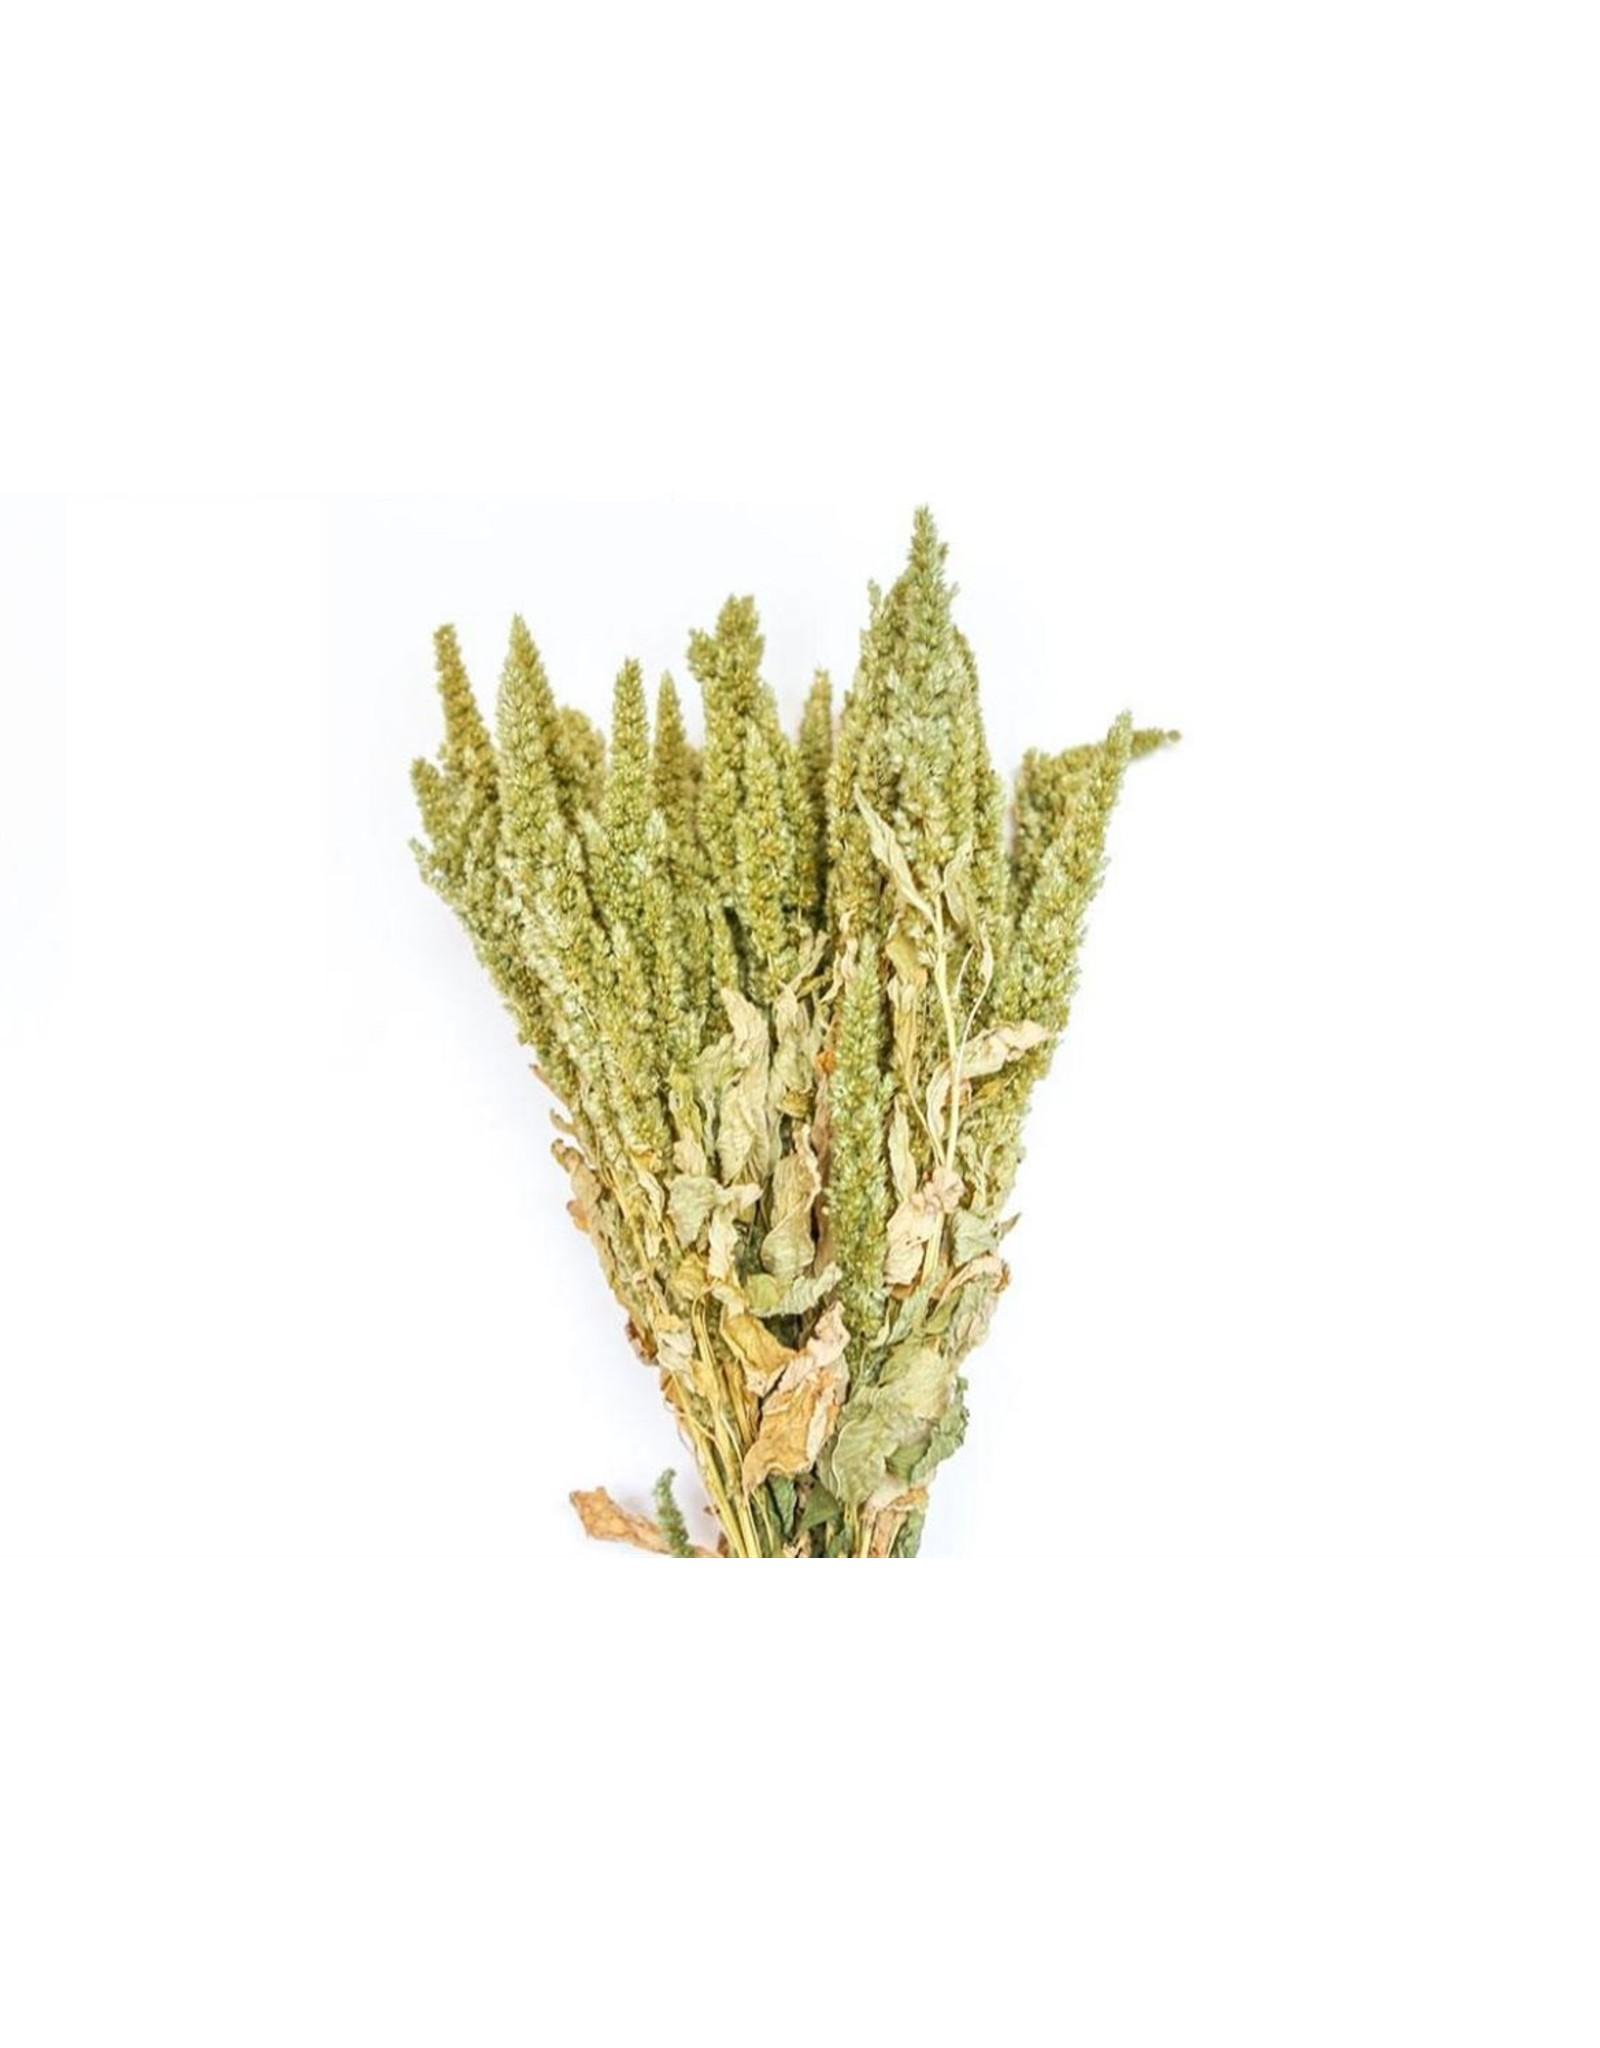 HD Bündel Amaranthus grün Slv ↑50.0 (x 15)